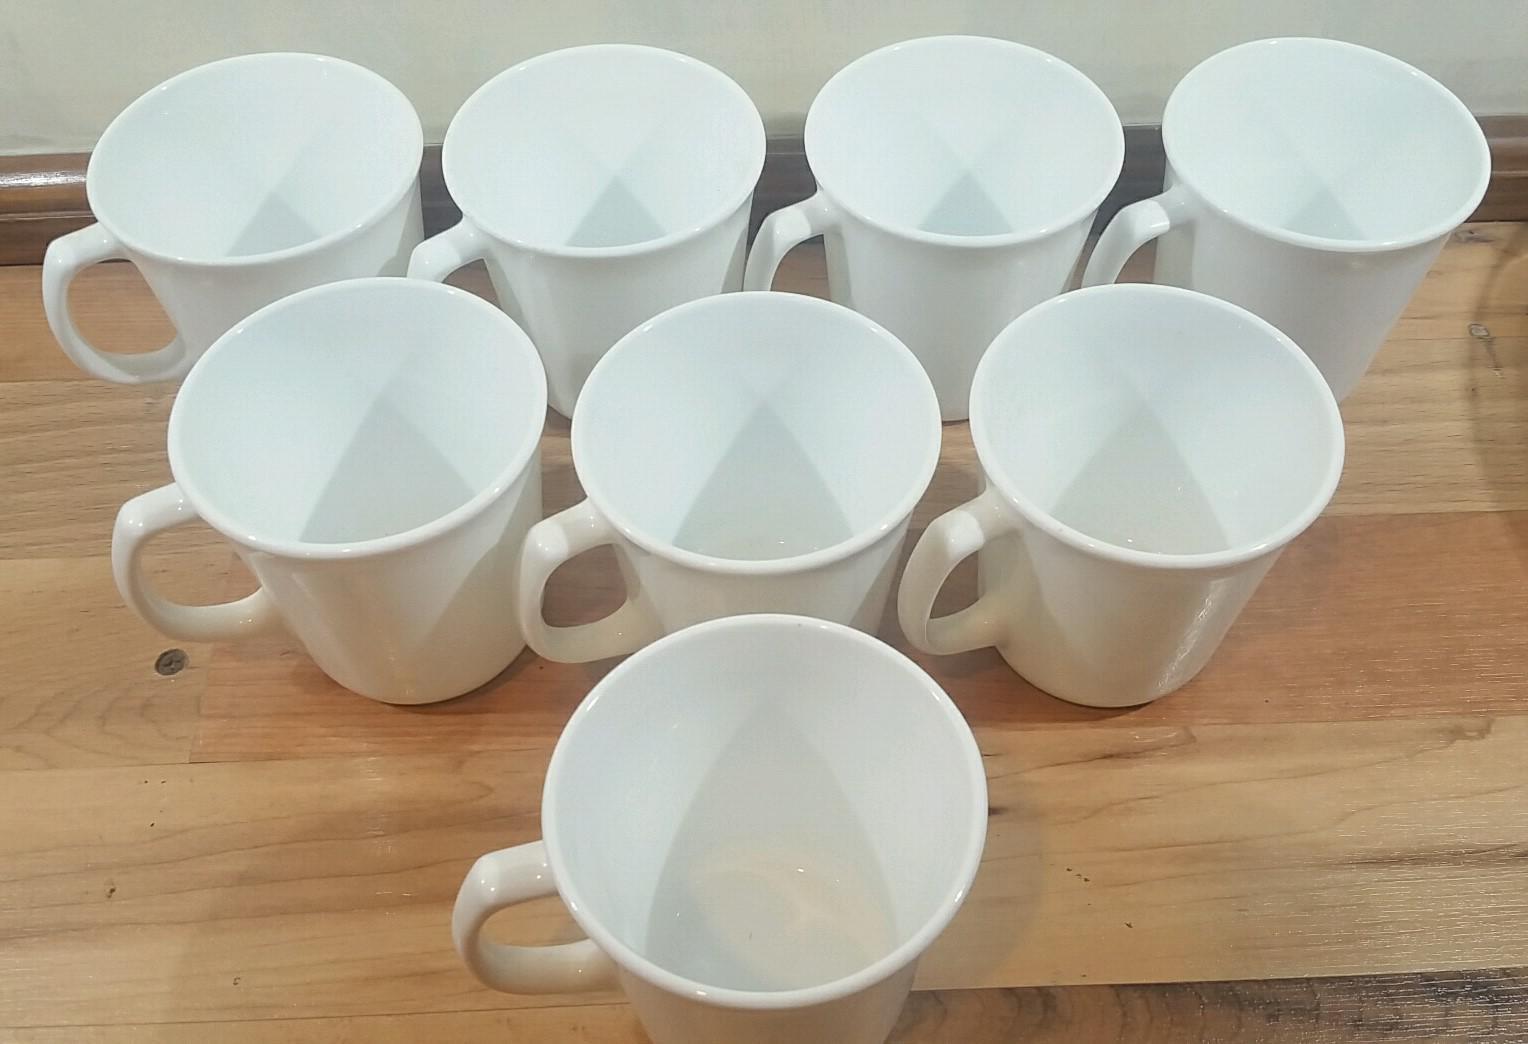 Corelle Winter Frost White Plain Supreme Coffee Cups - Set of 8 - Image 3 of  sc 1 st  Chairish & Corelle Winter Frost White Plain Supreme Coffee Cups - Set of 8 ...